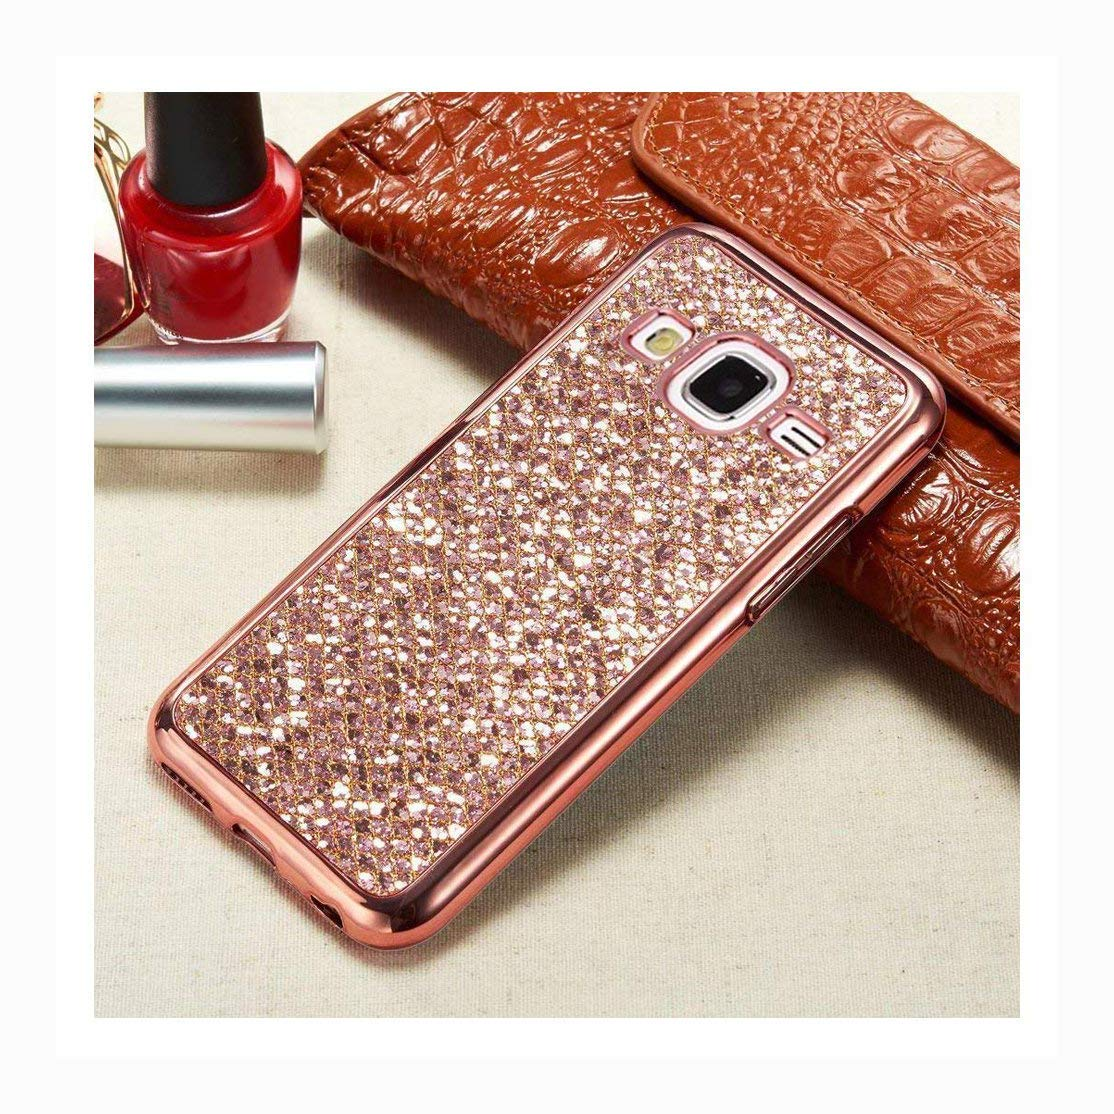 Amazon.com: Mixneer for Samsung Galaxy S4 Mini Case, Fashion ...